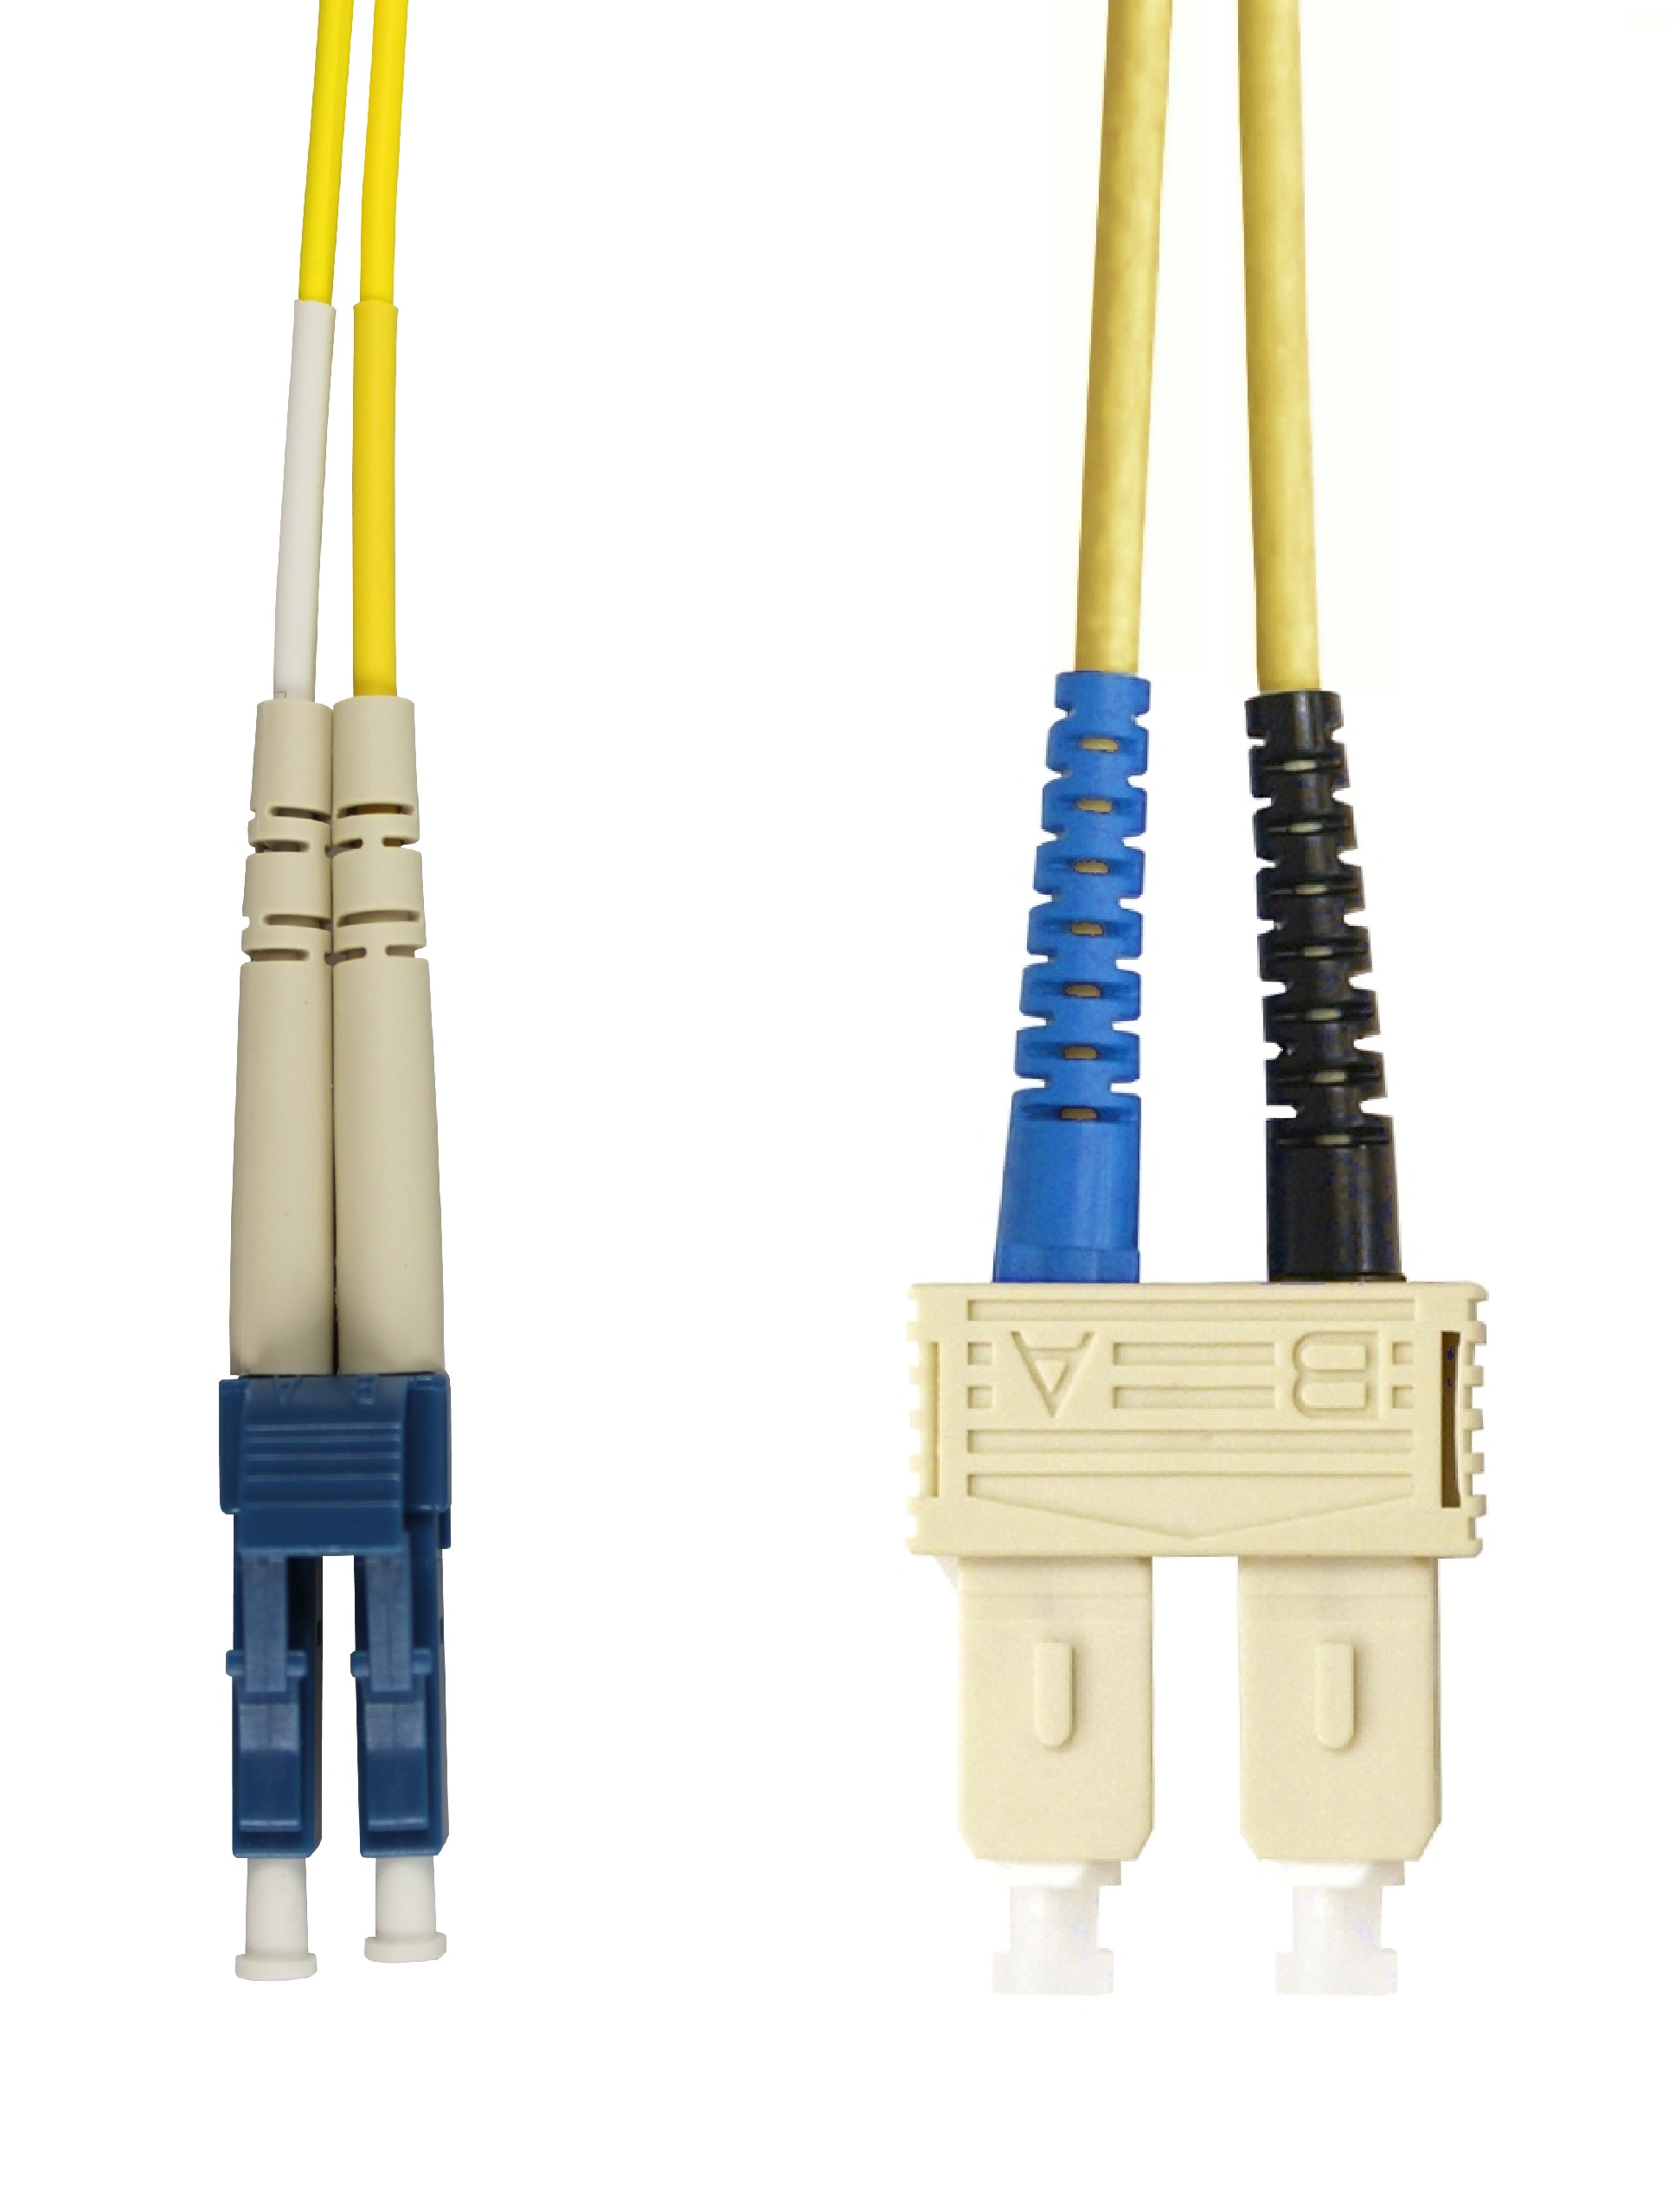 1 Stk LWL Patchkabel Duplex LC/SC, 9/125µm OS2, LS0H-3, gelb, 2.0m HLP29LC02F